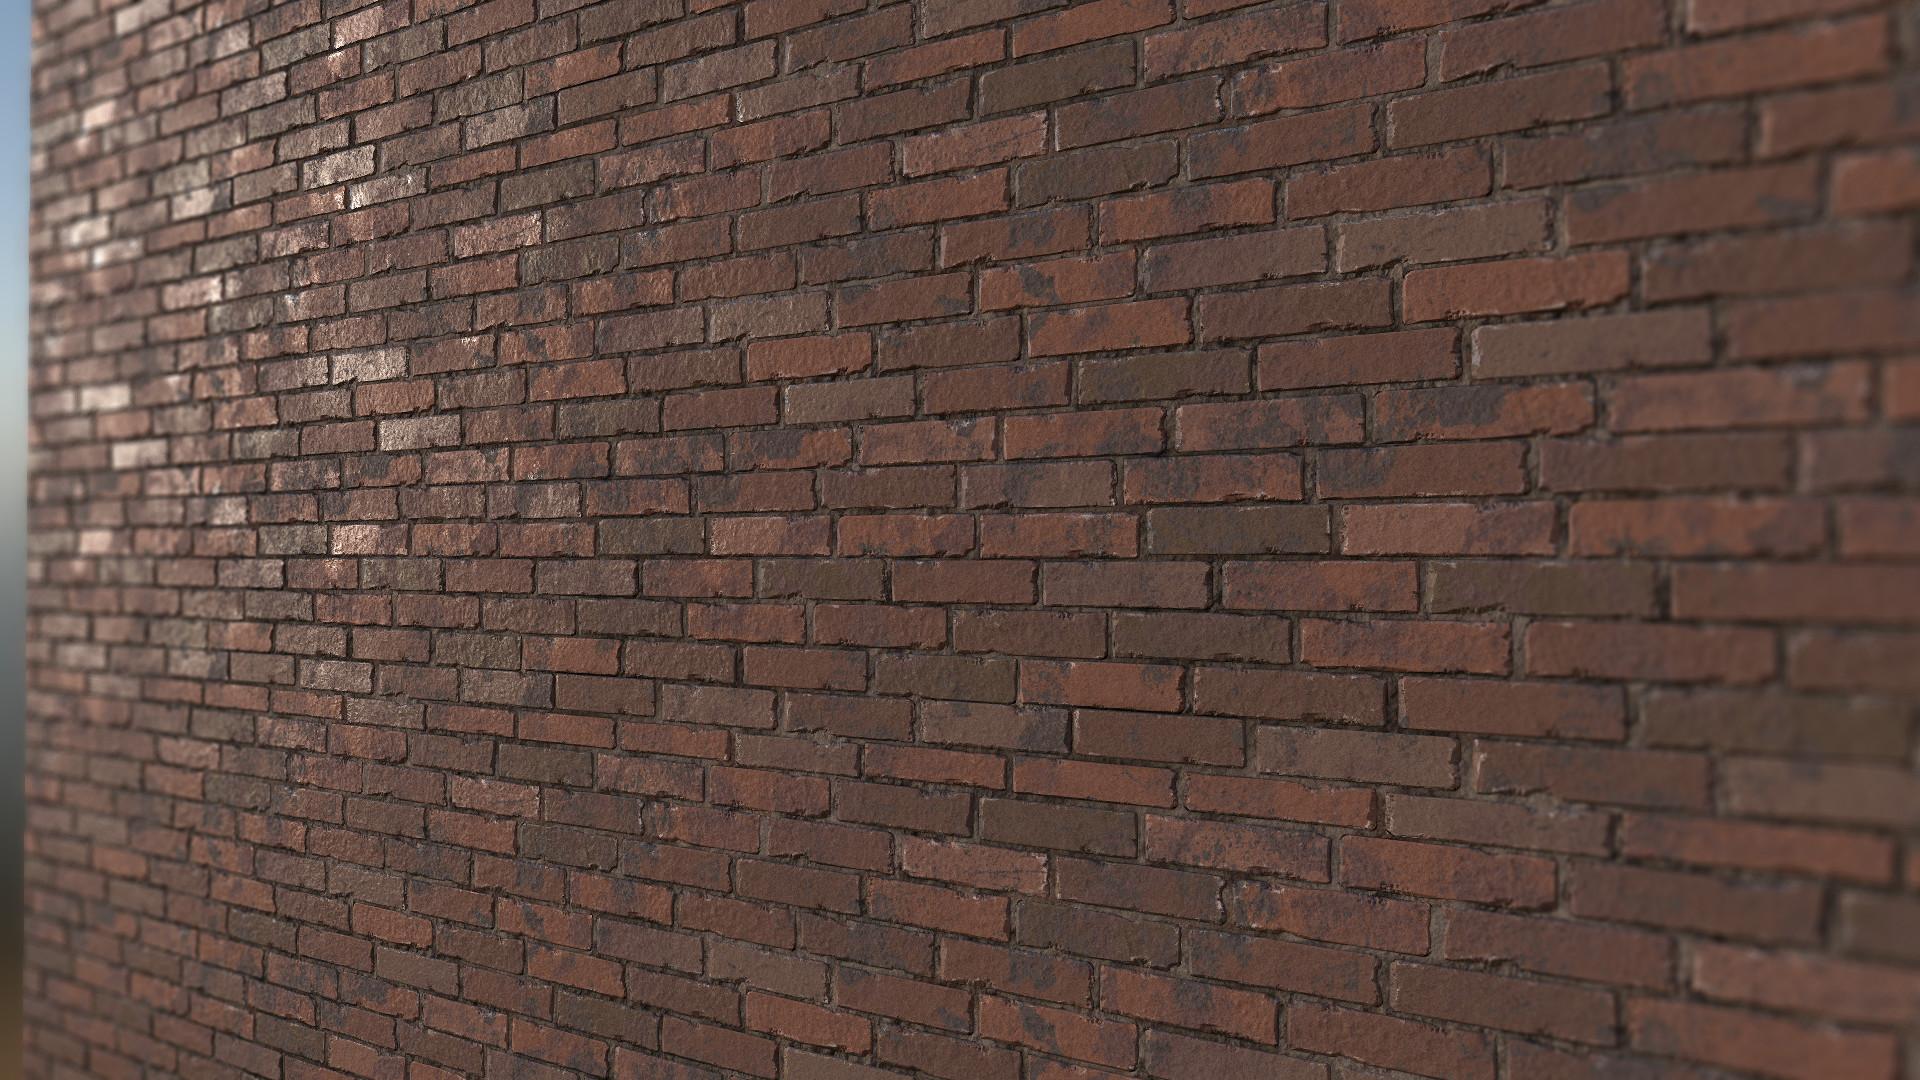 Andre jonsson brickwall 01